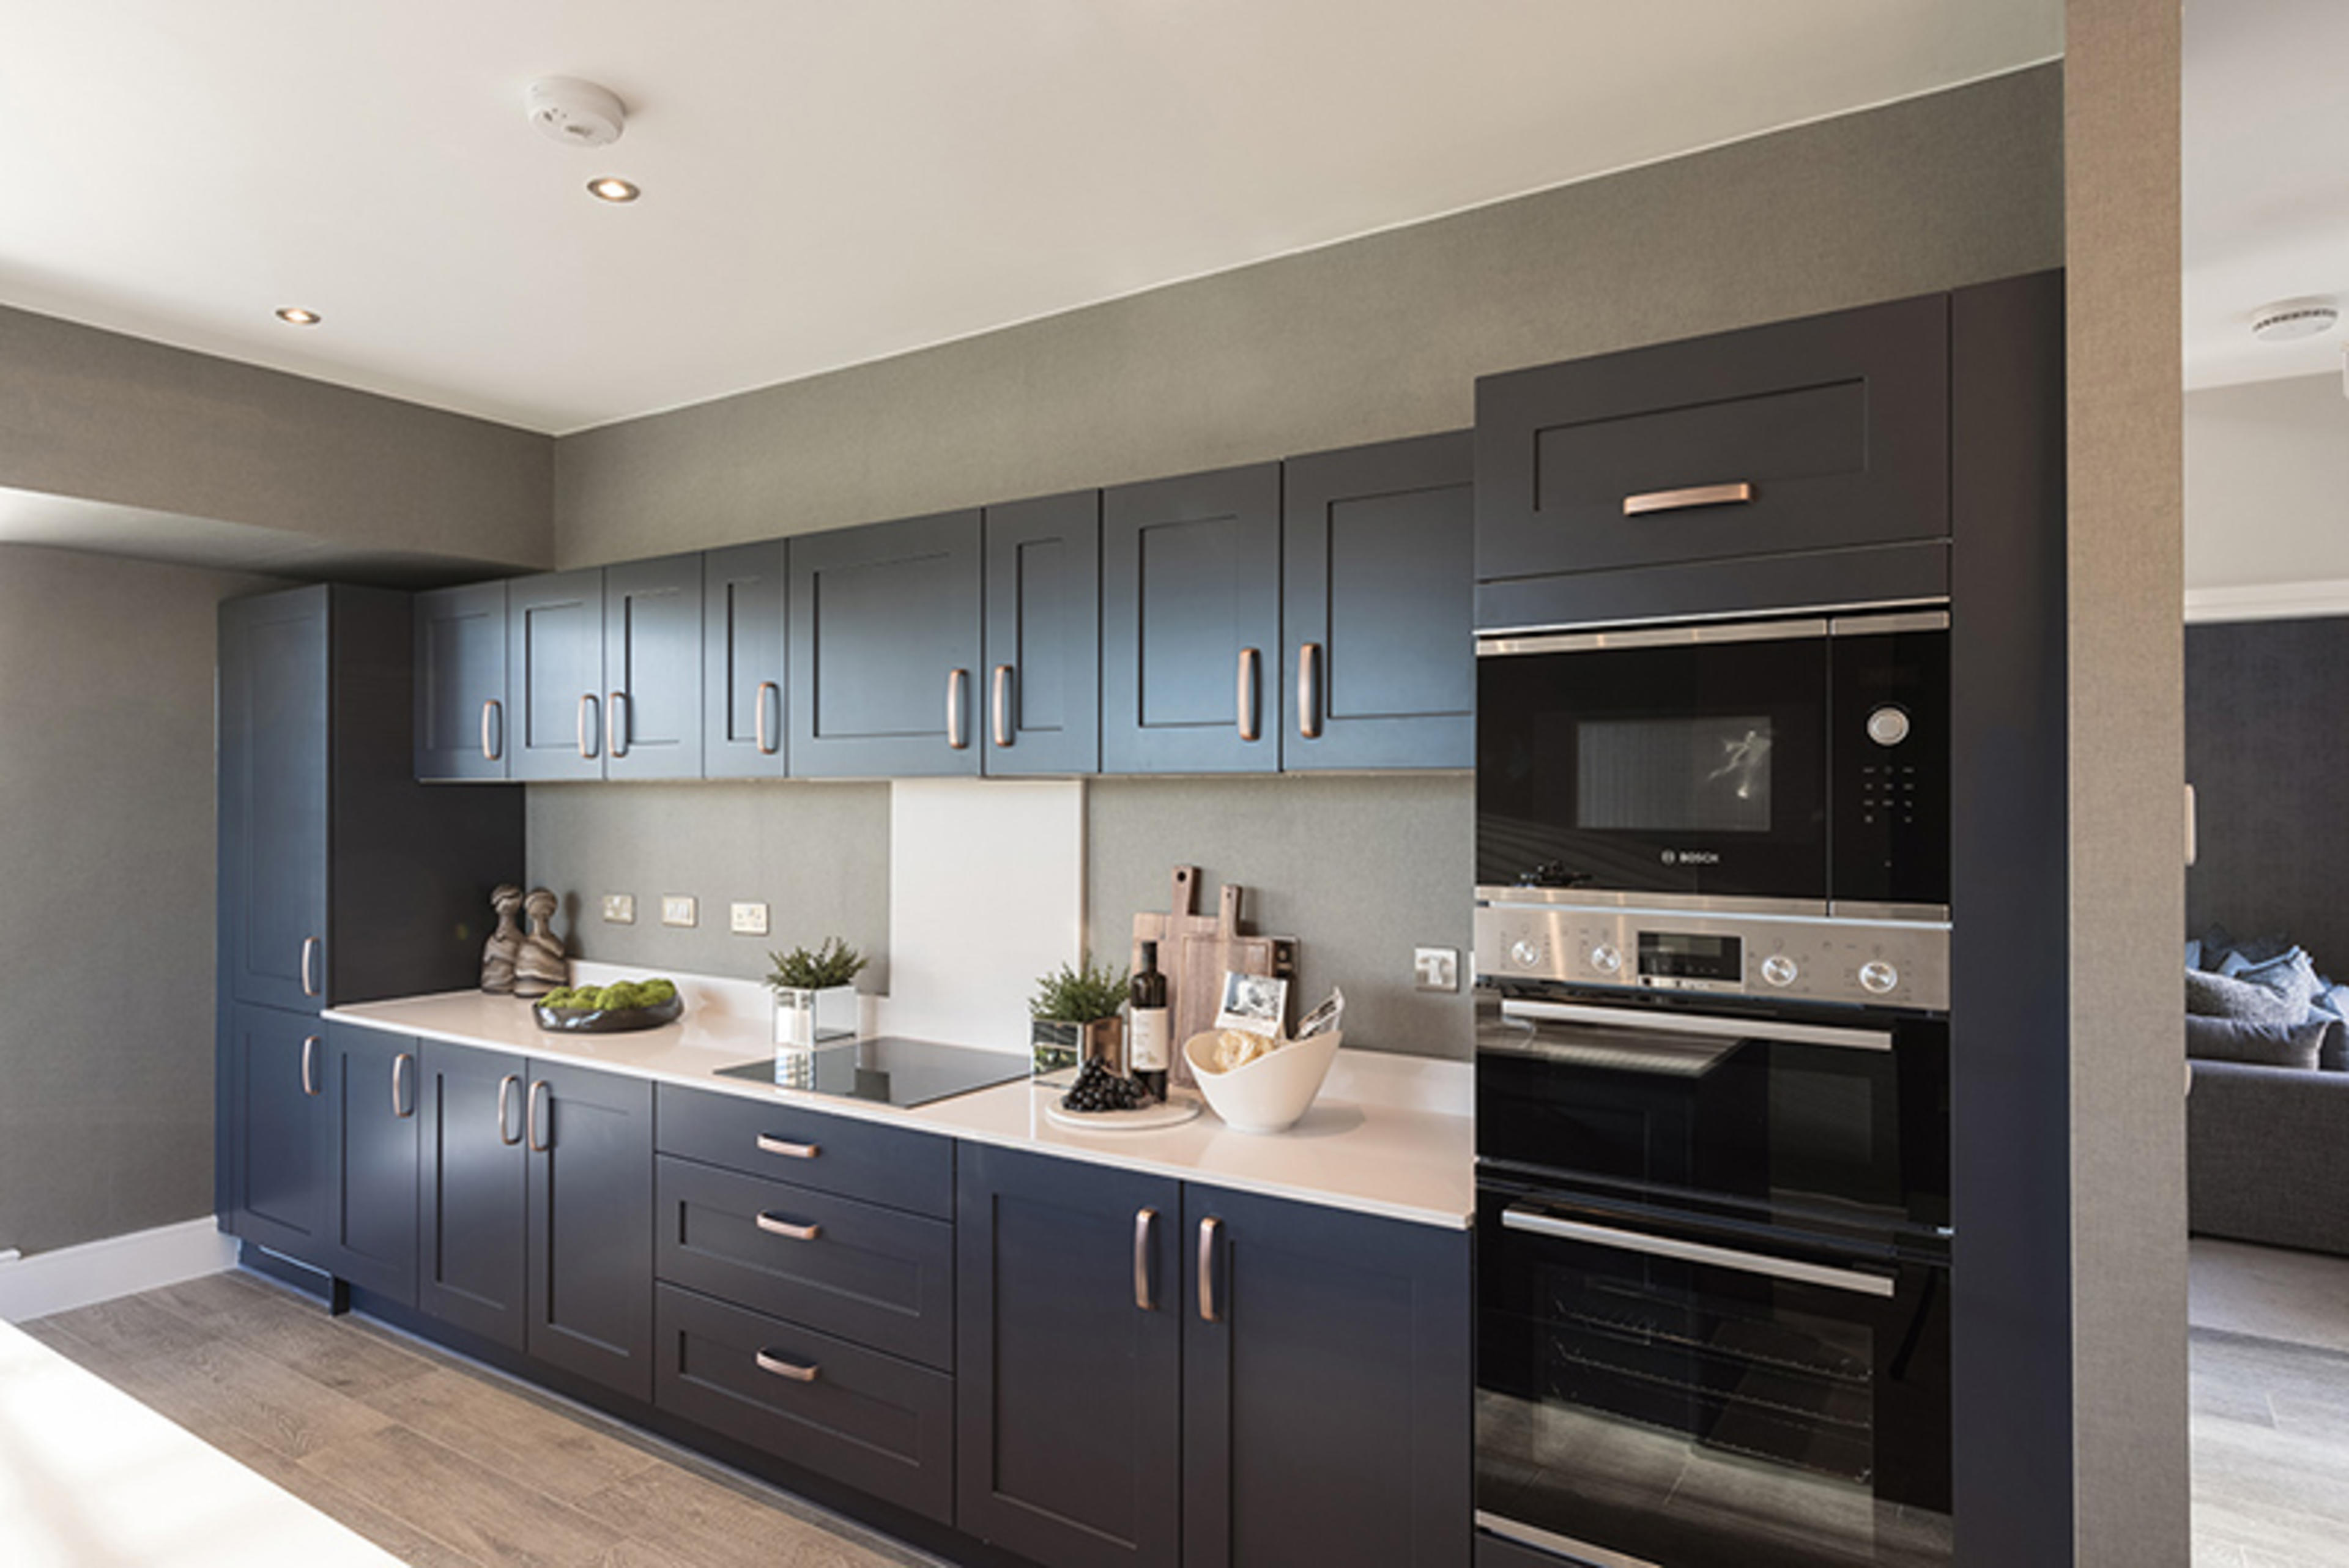 watling-grange-harrogate-merevale-4-bed-home-kitchen-2